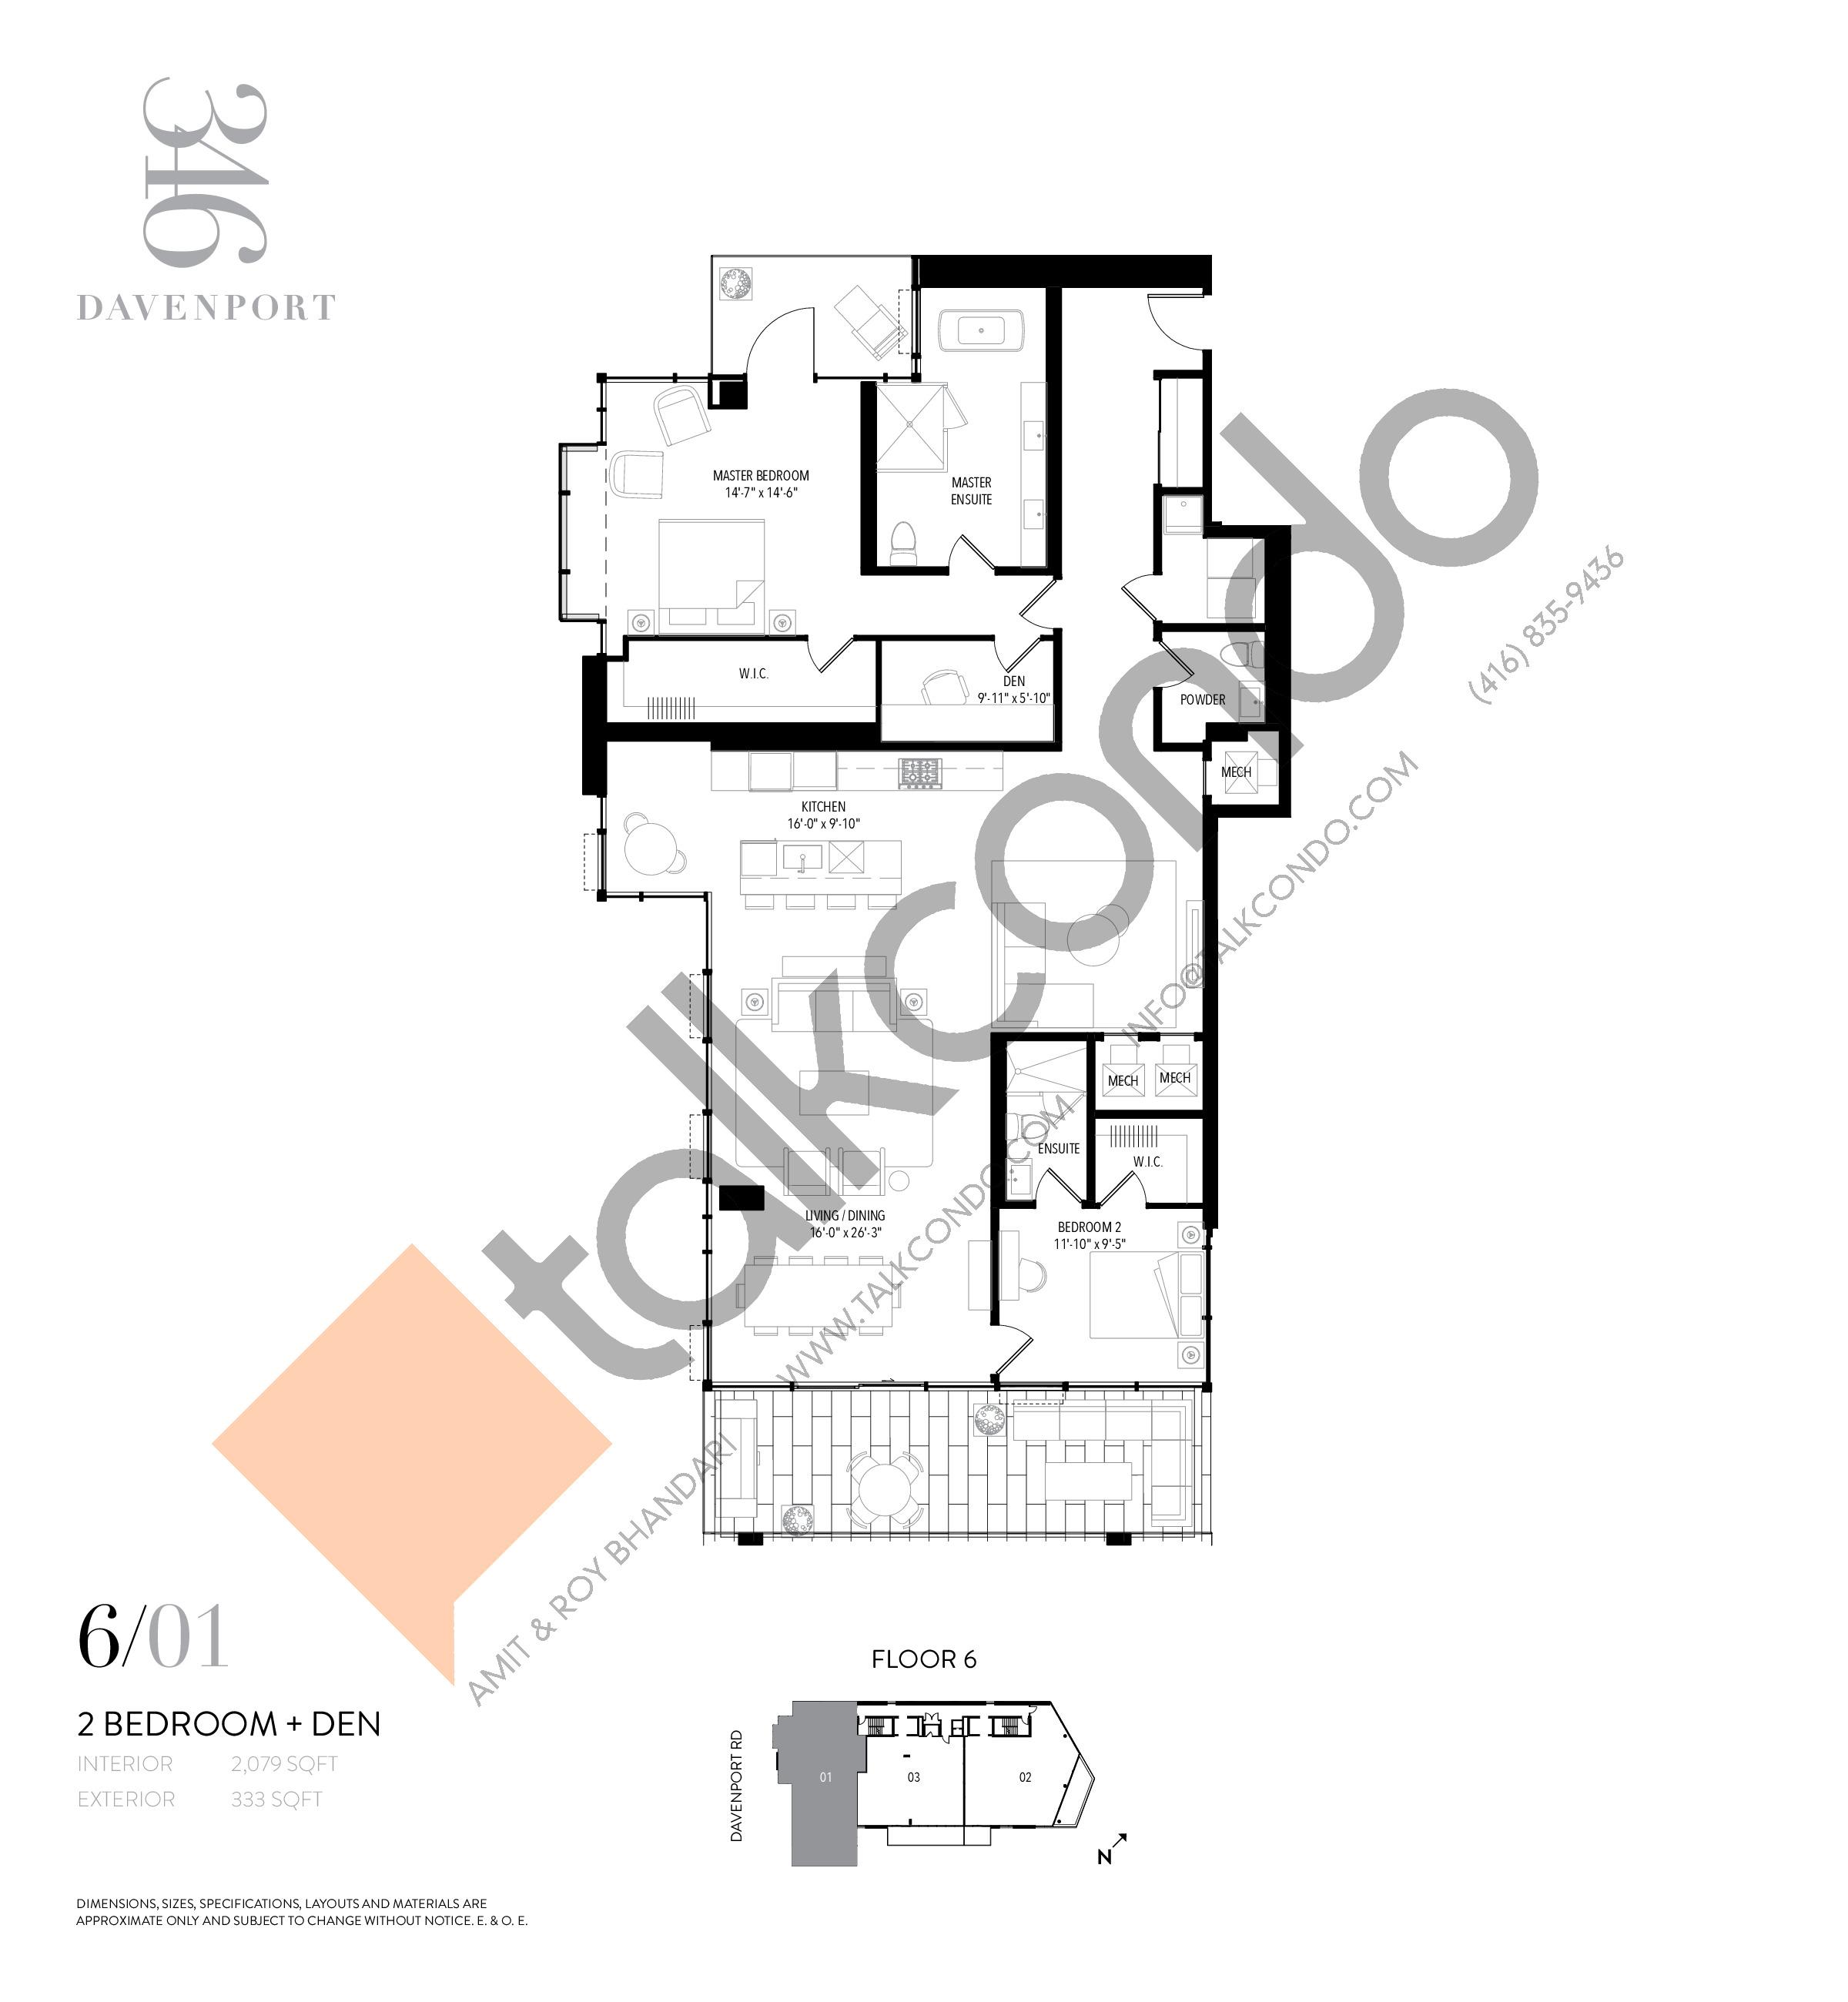 Unit 601 Floor Plan at 346 Davenport Condos - 2079 sq.ft